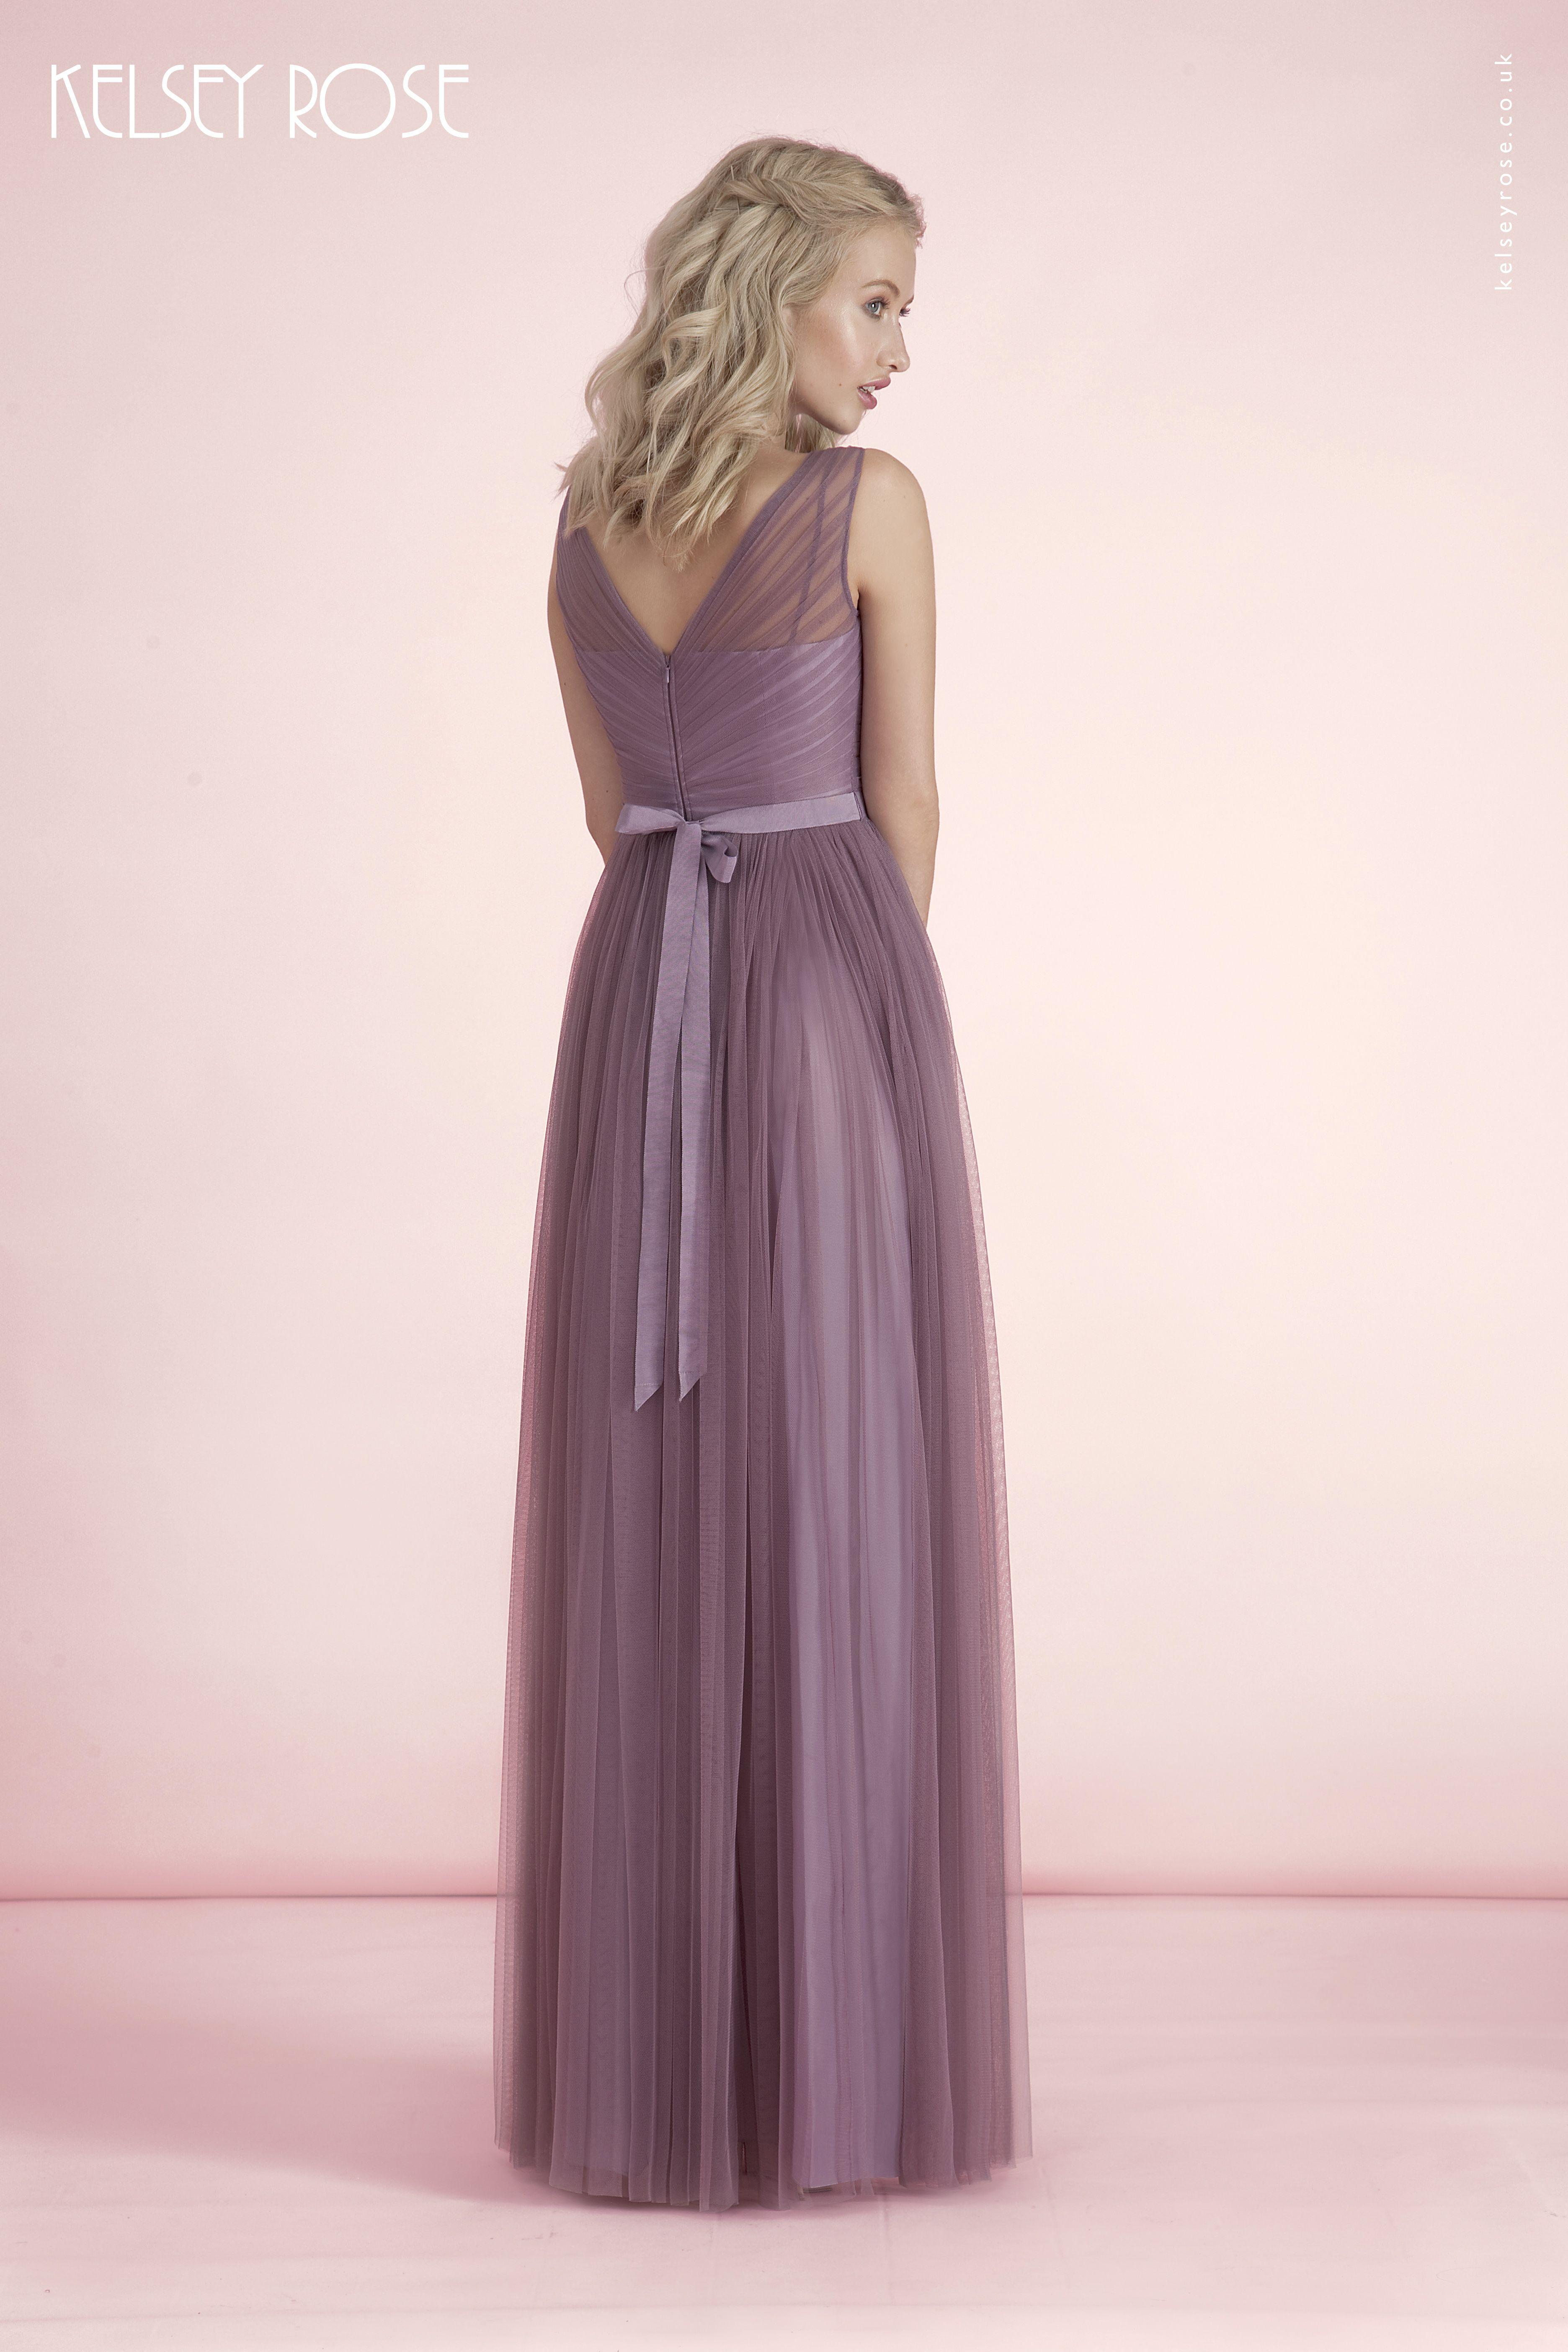 Kelsey Rose Bridesmaid Style 50110   Wedding Bridesmaids Dresses ...